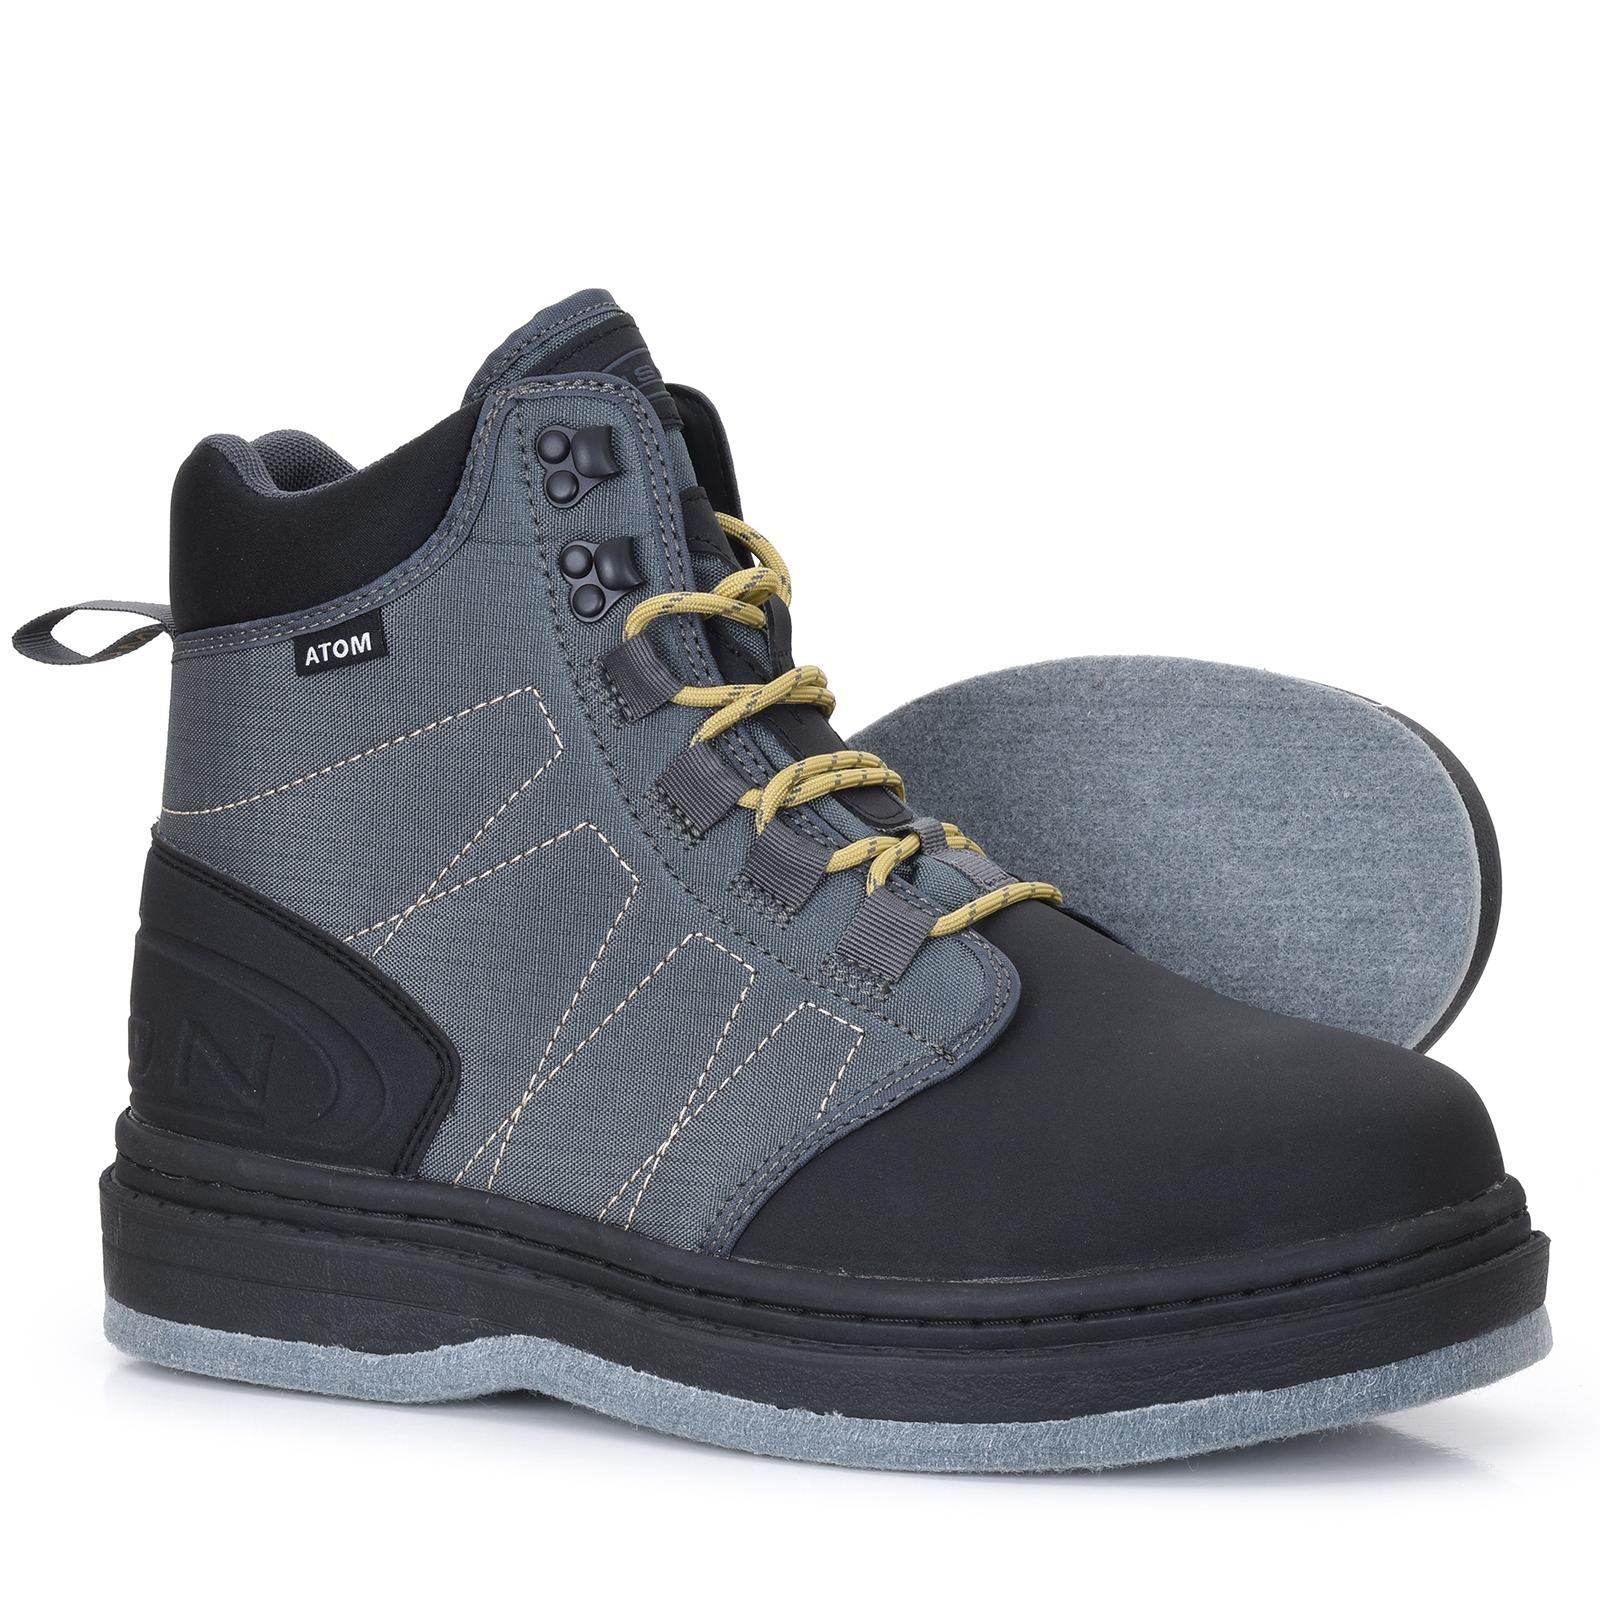 Atom Felt Boot